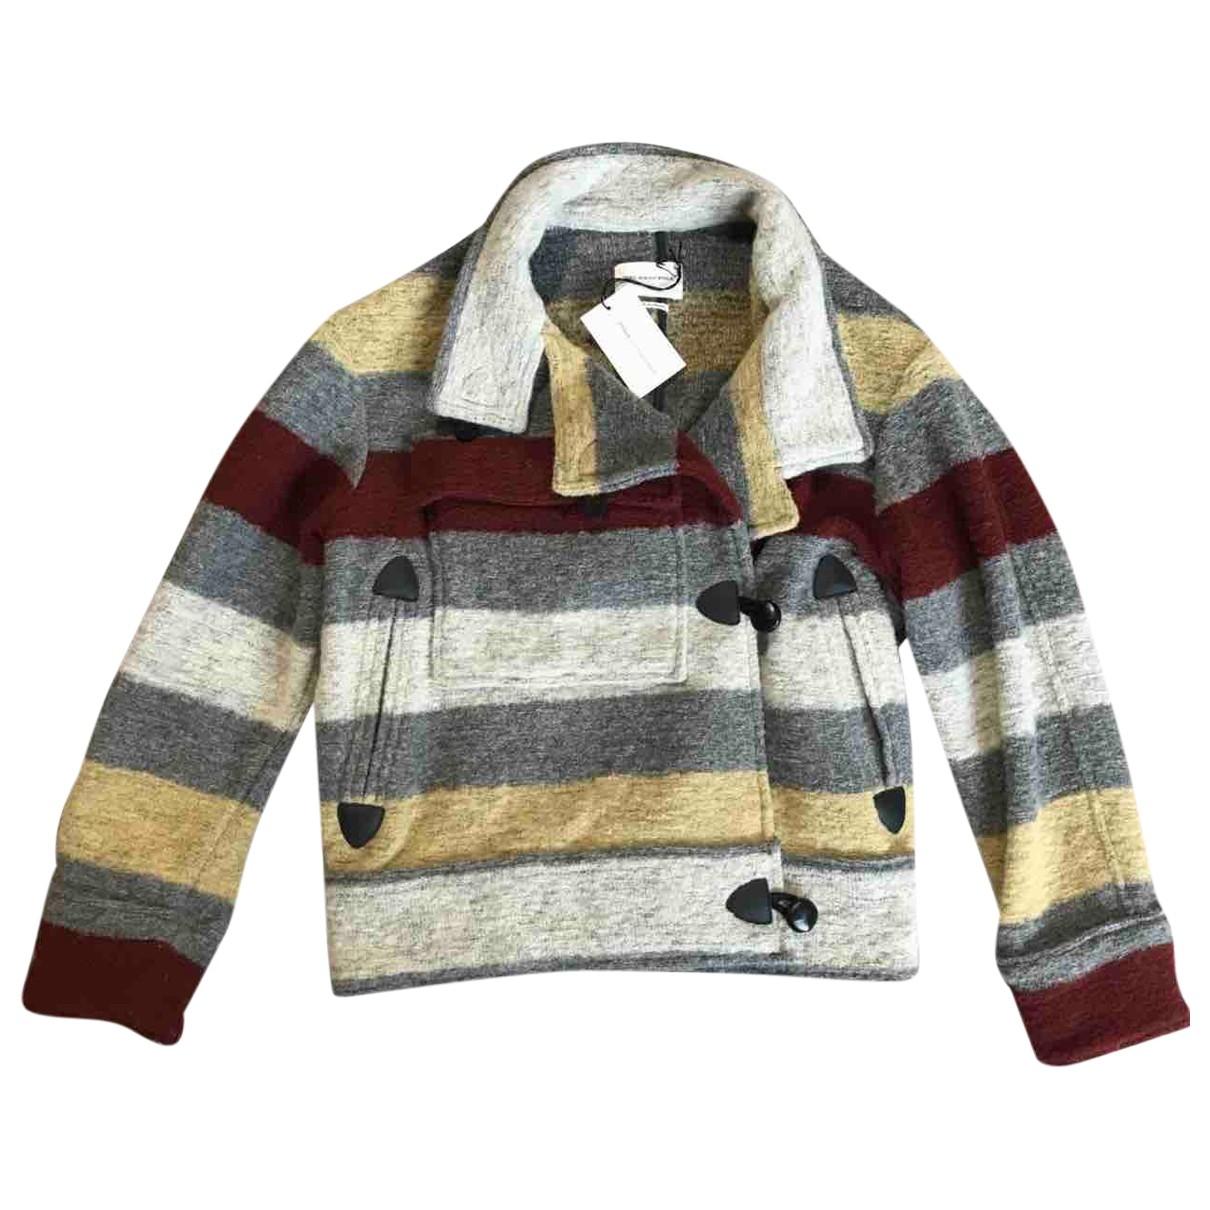 Isabel Marant Etoile \N Multicolour Wool coat for Women 34 FR